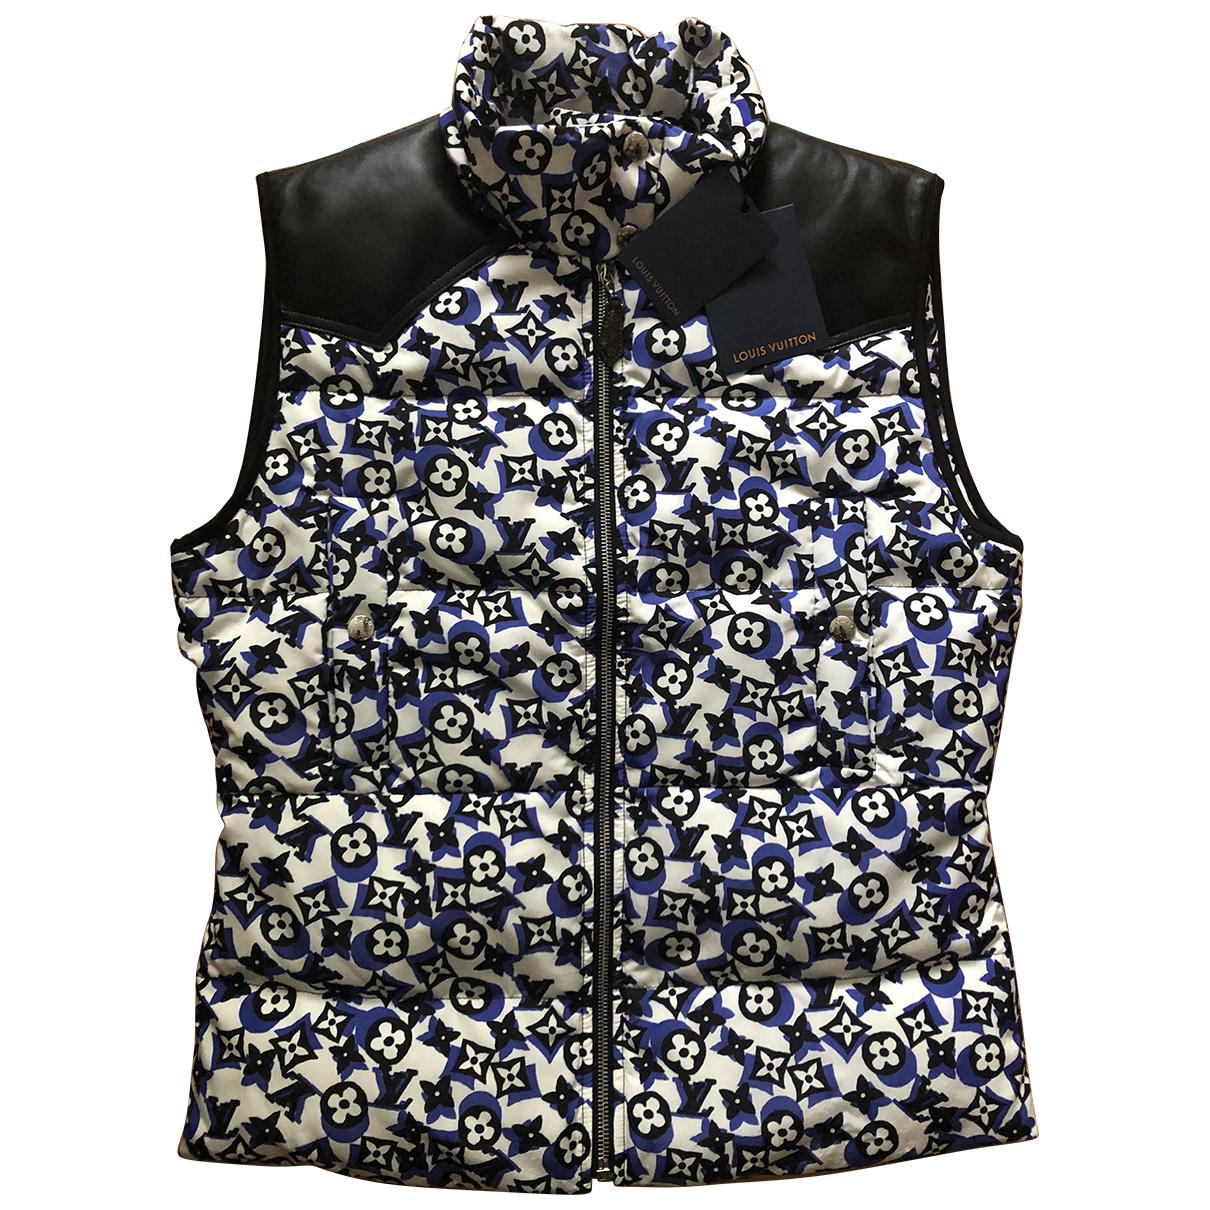 Louis Vuitton \N Jacke in  Blau Polyester